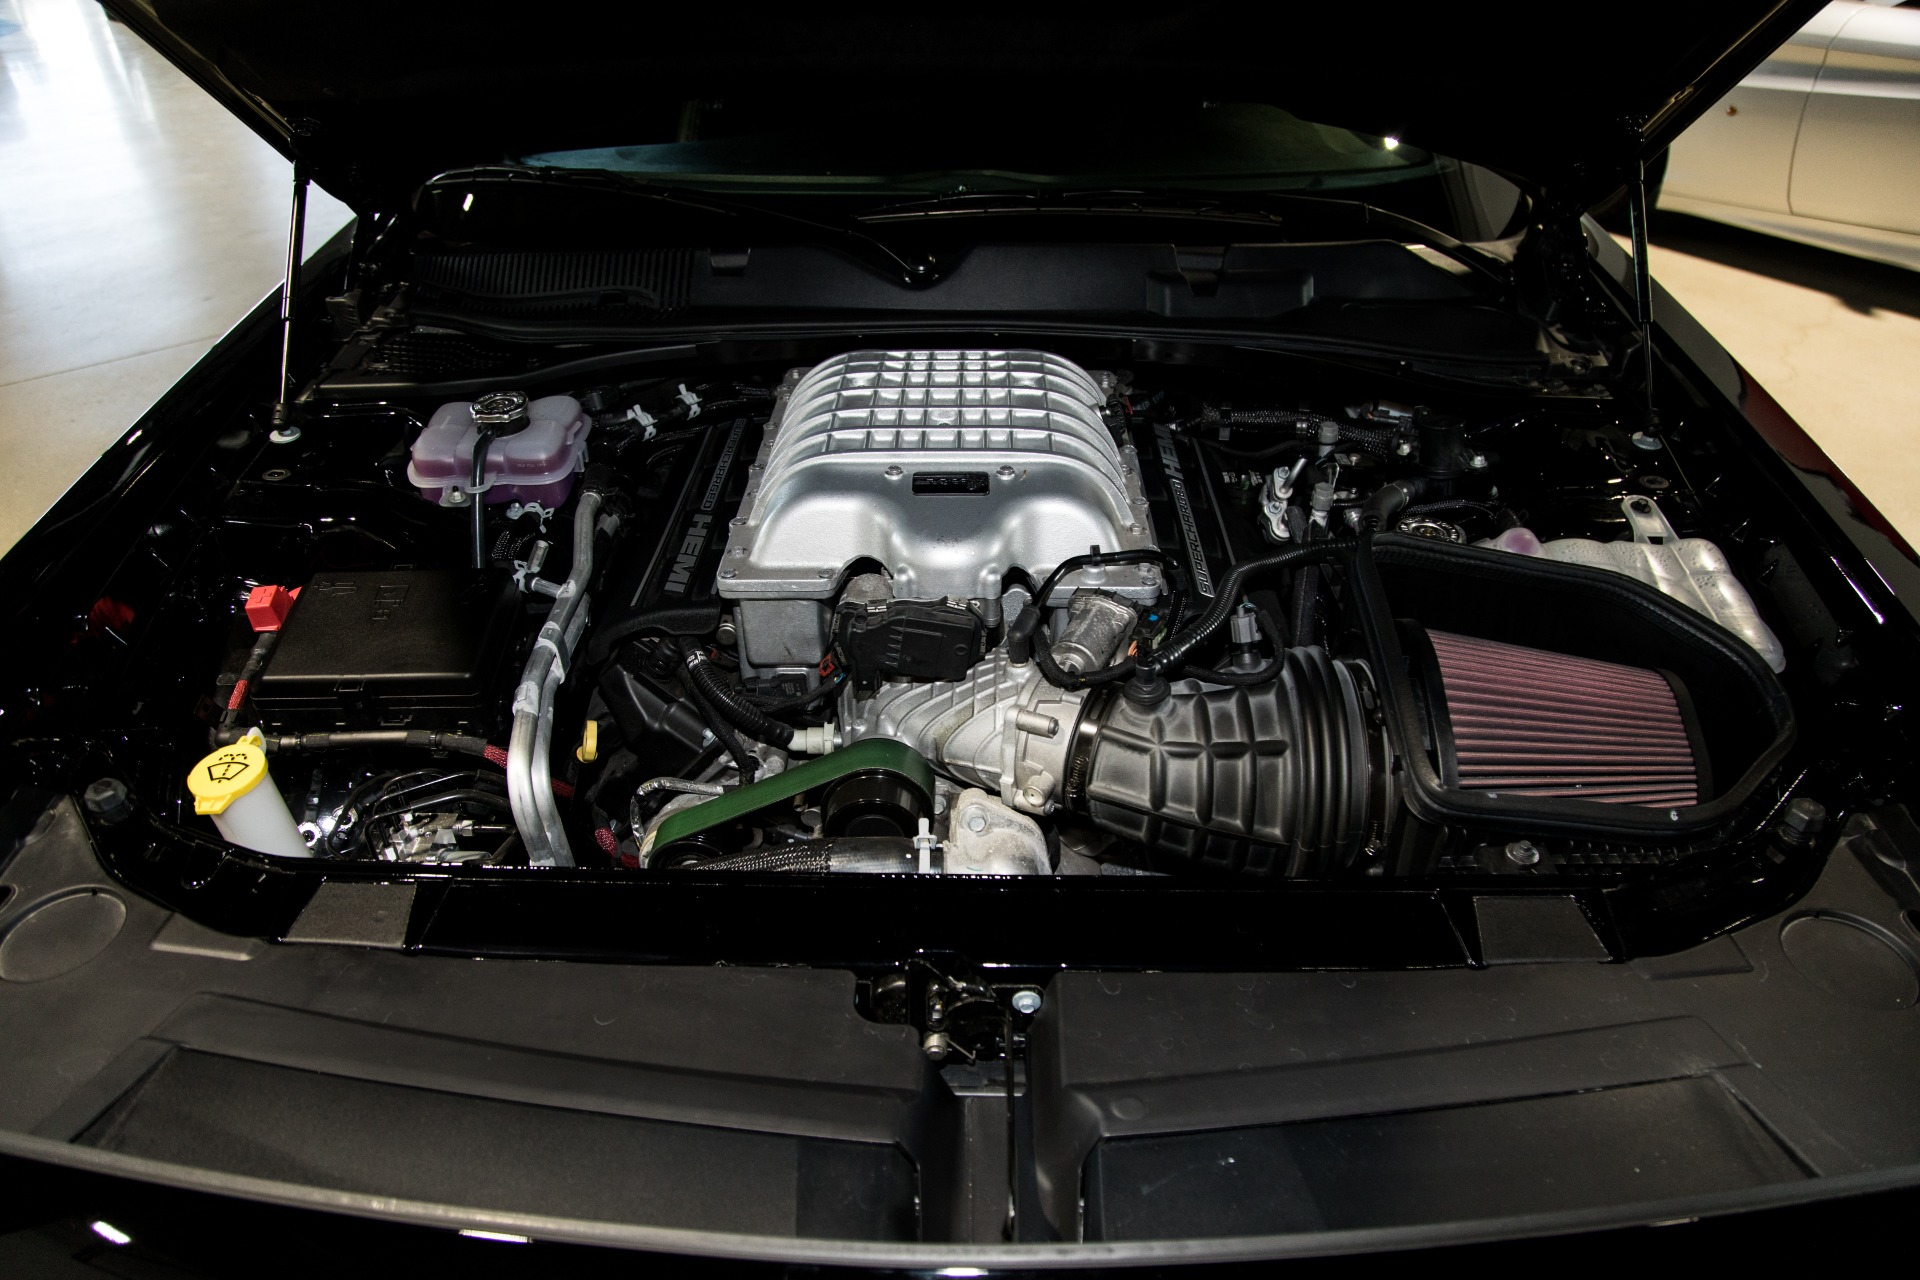 dodge hellcat redeye engine price Used 2019 Dodge Challenger SRT Hellcat Redeye Widebody For